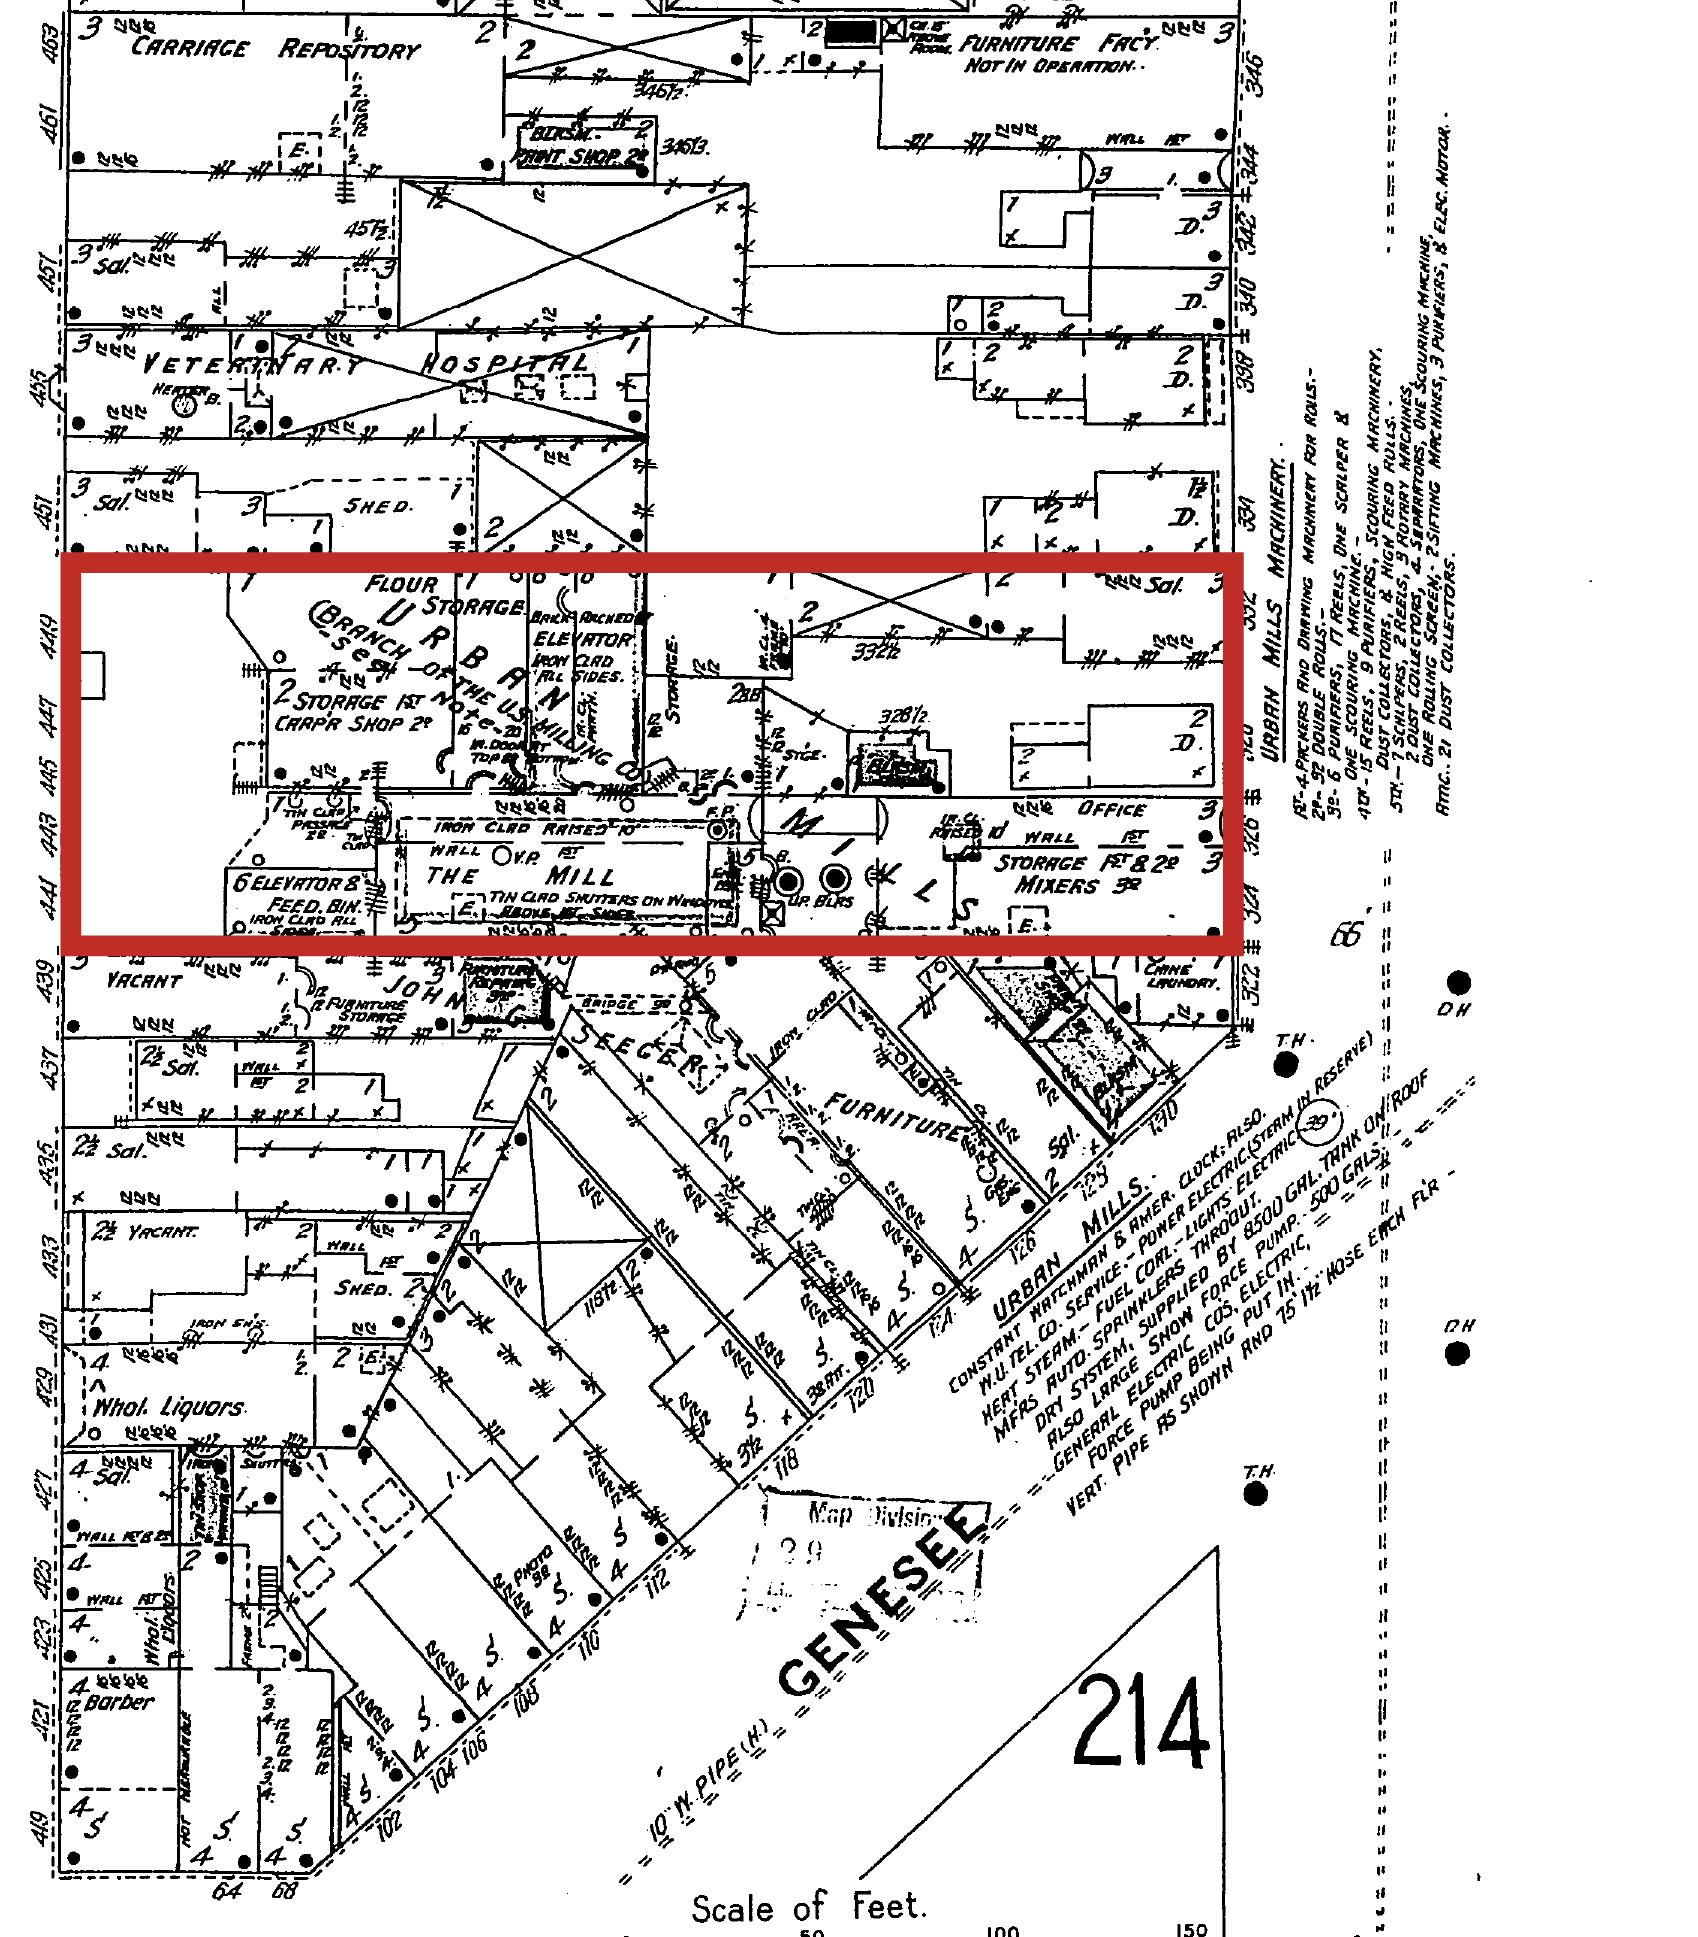 Oak and Genesee 1889